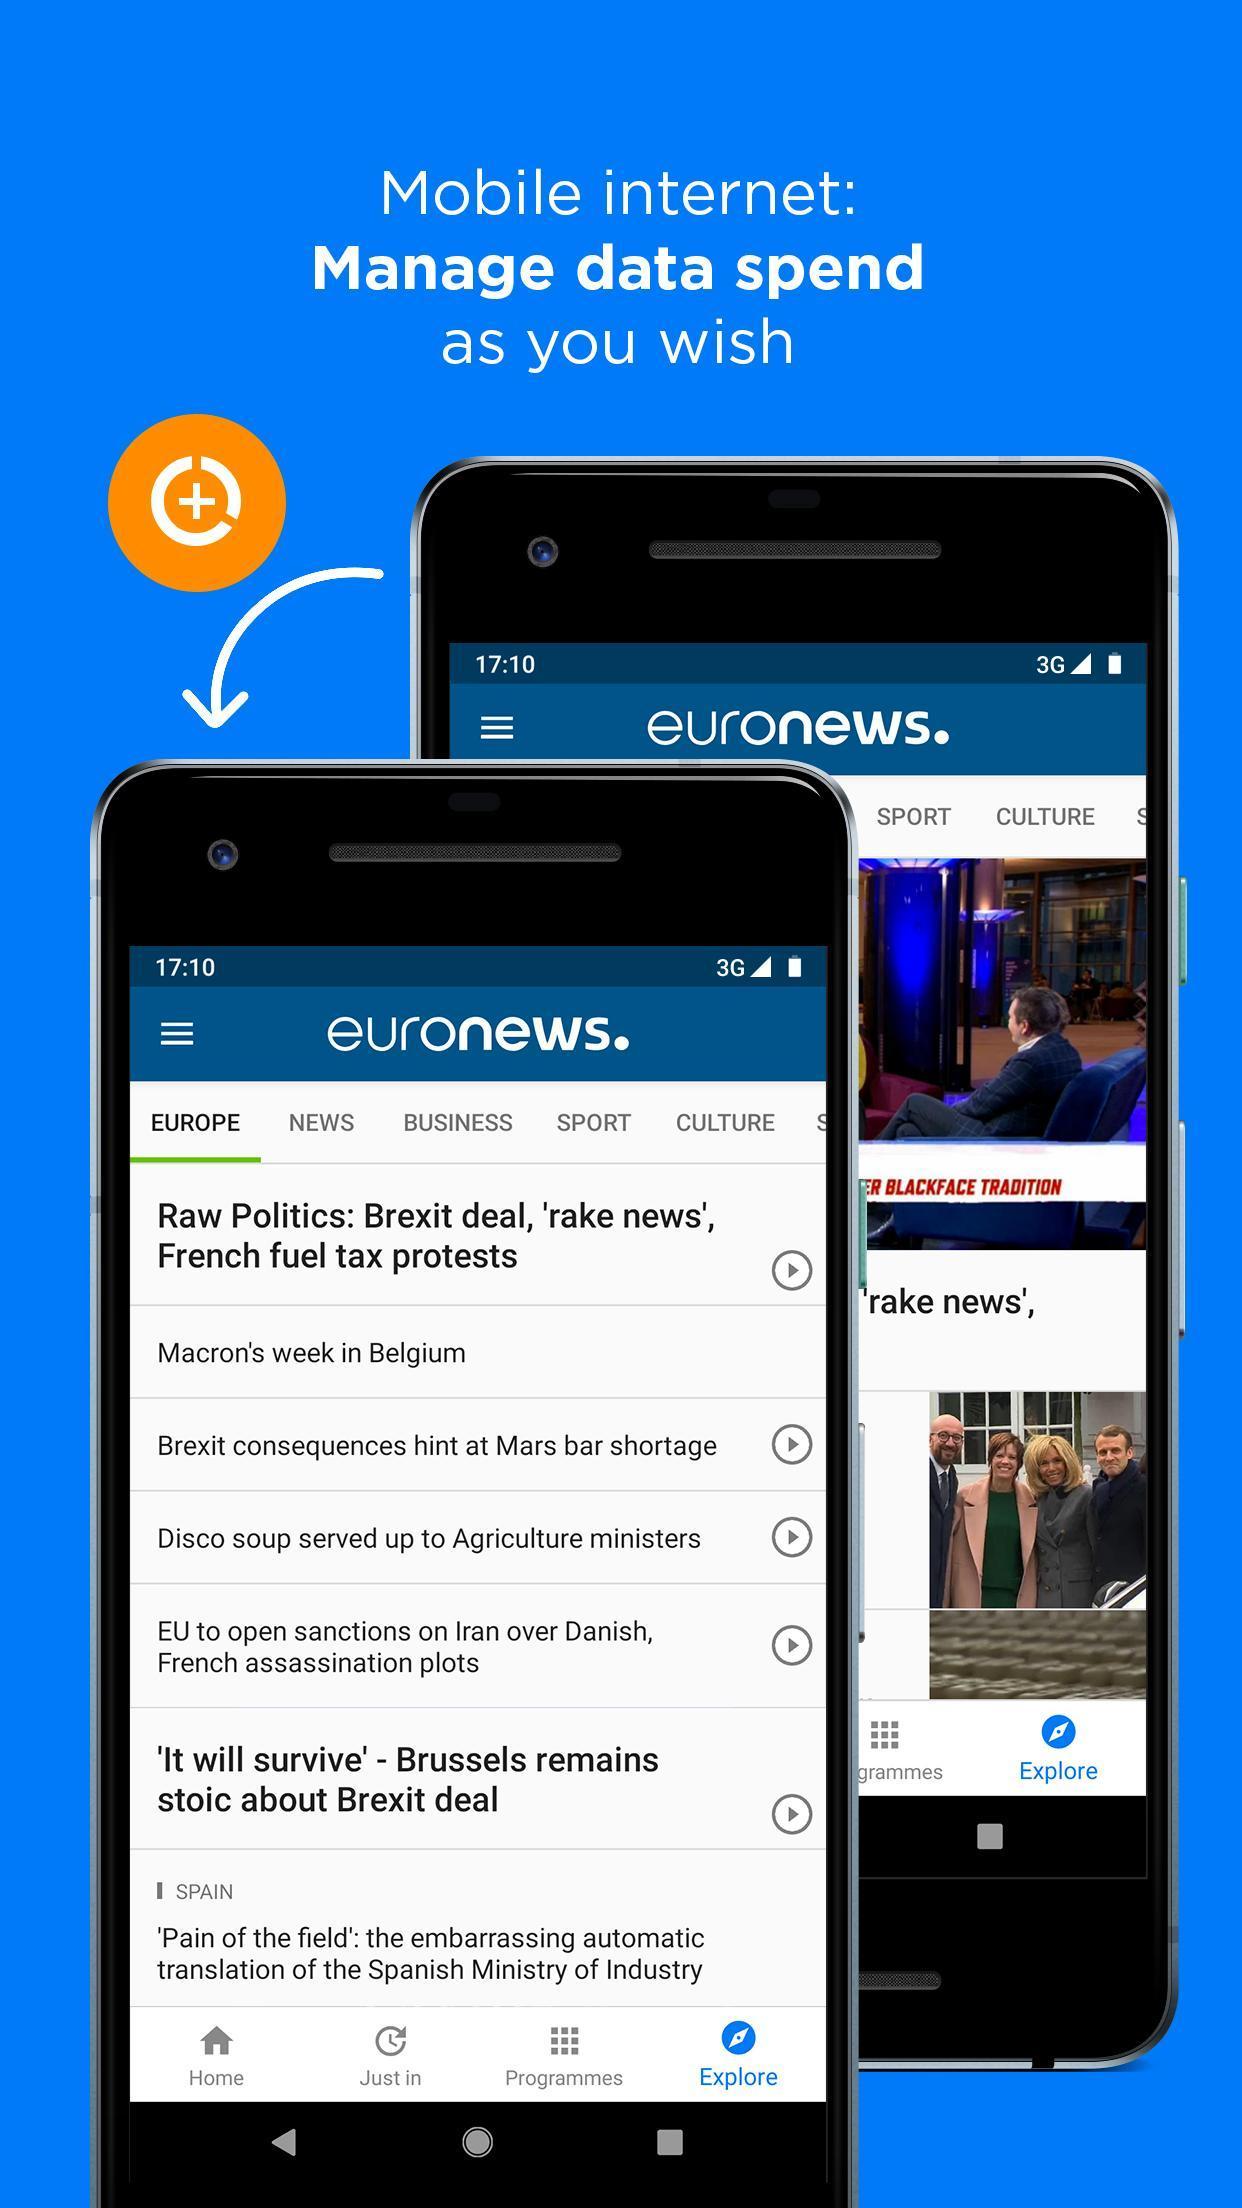 Euronews Daily breaking world news & Live TV 5.2.1 Screenshot 7